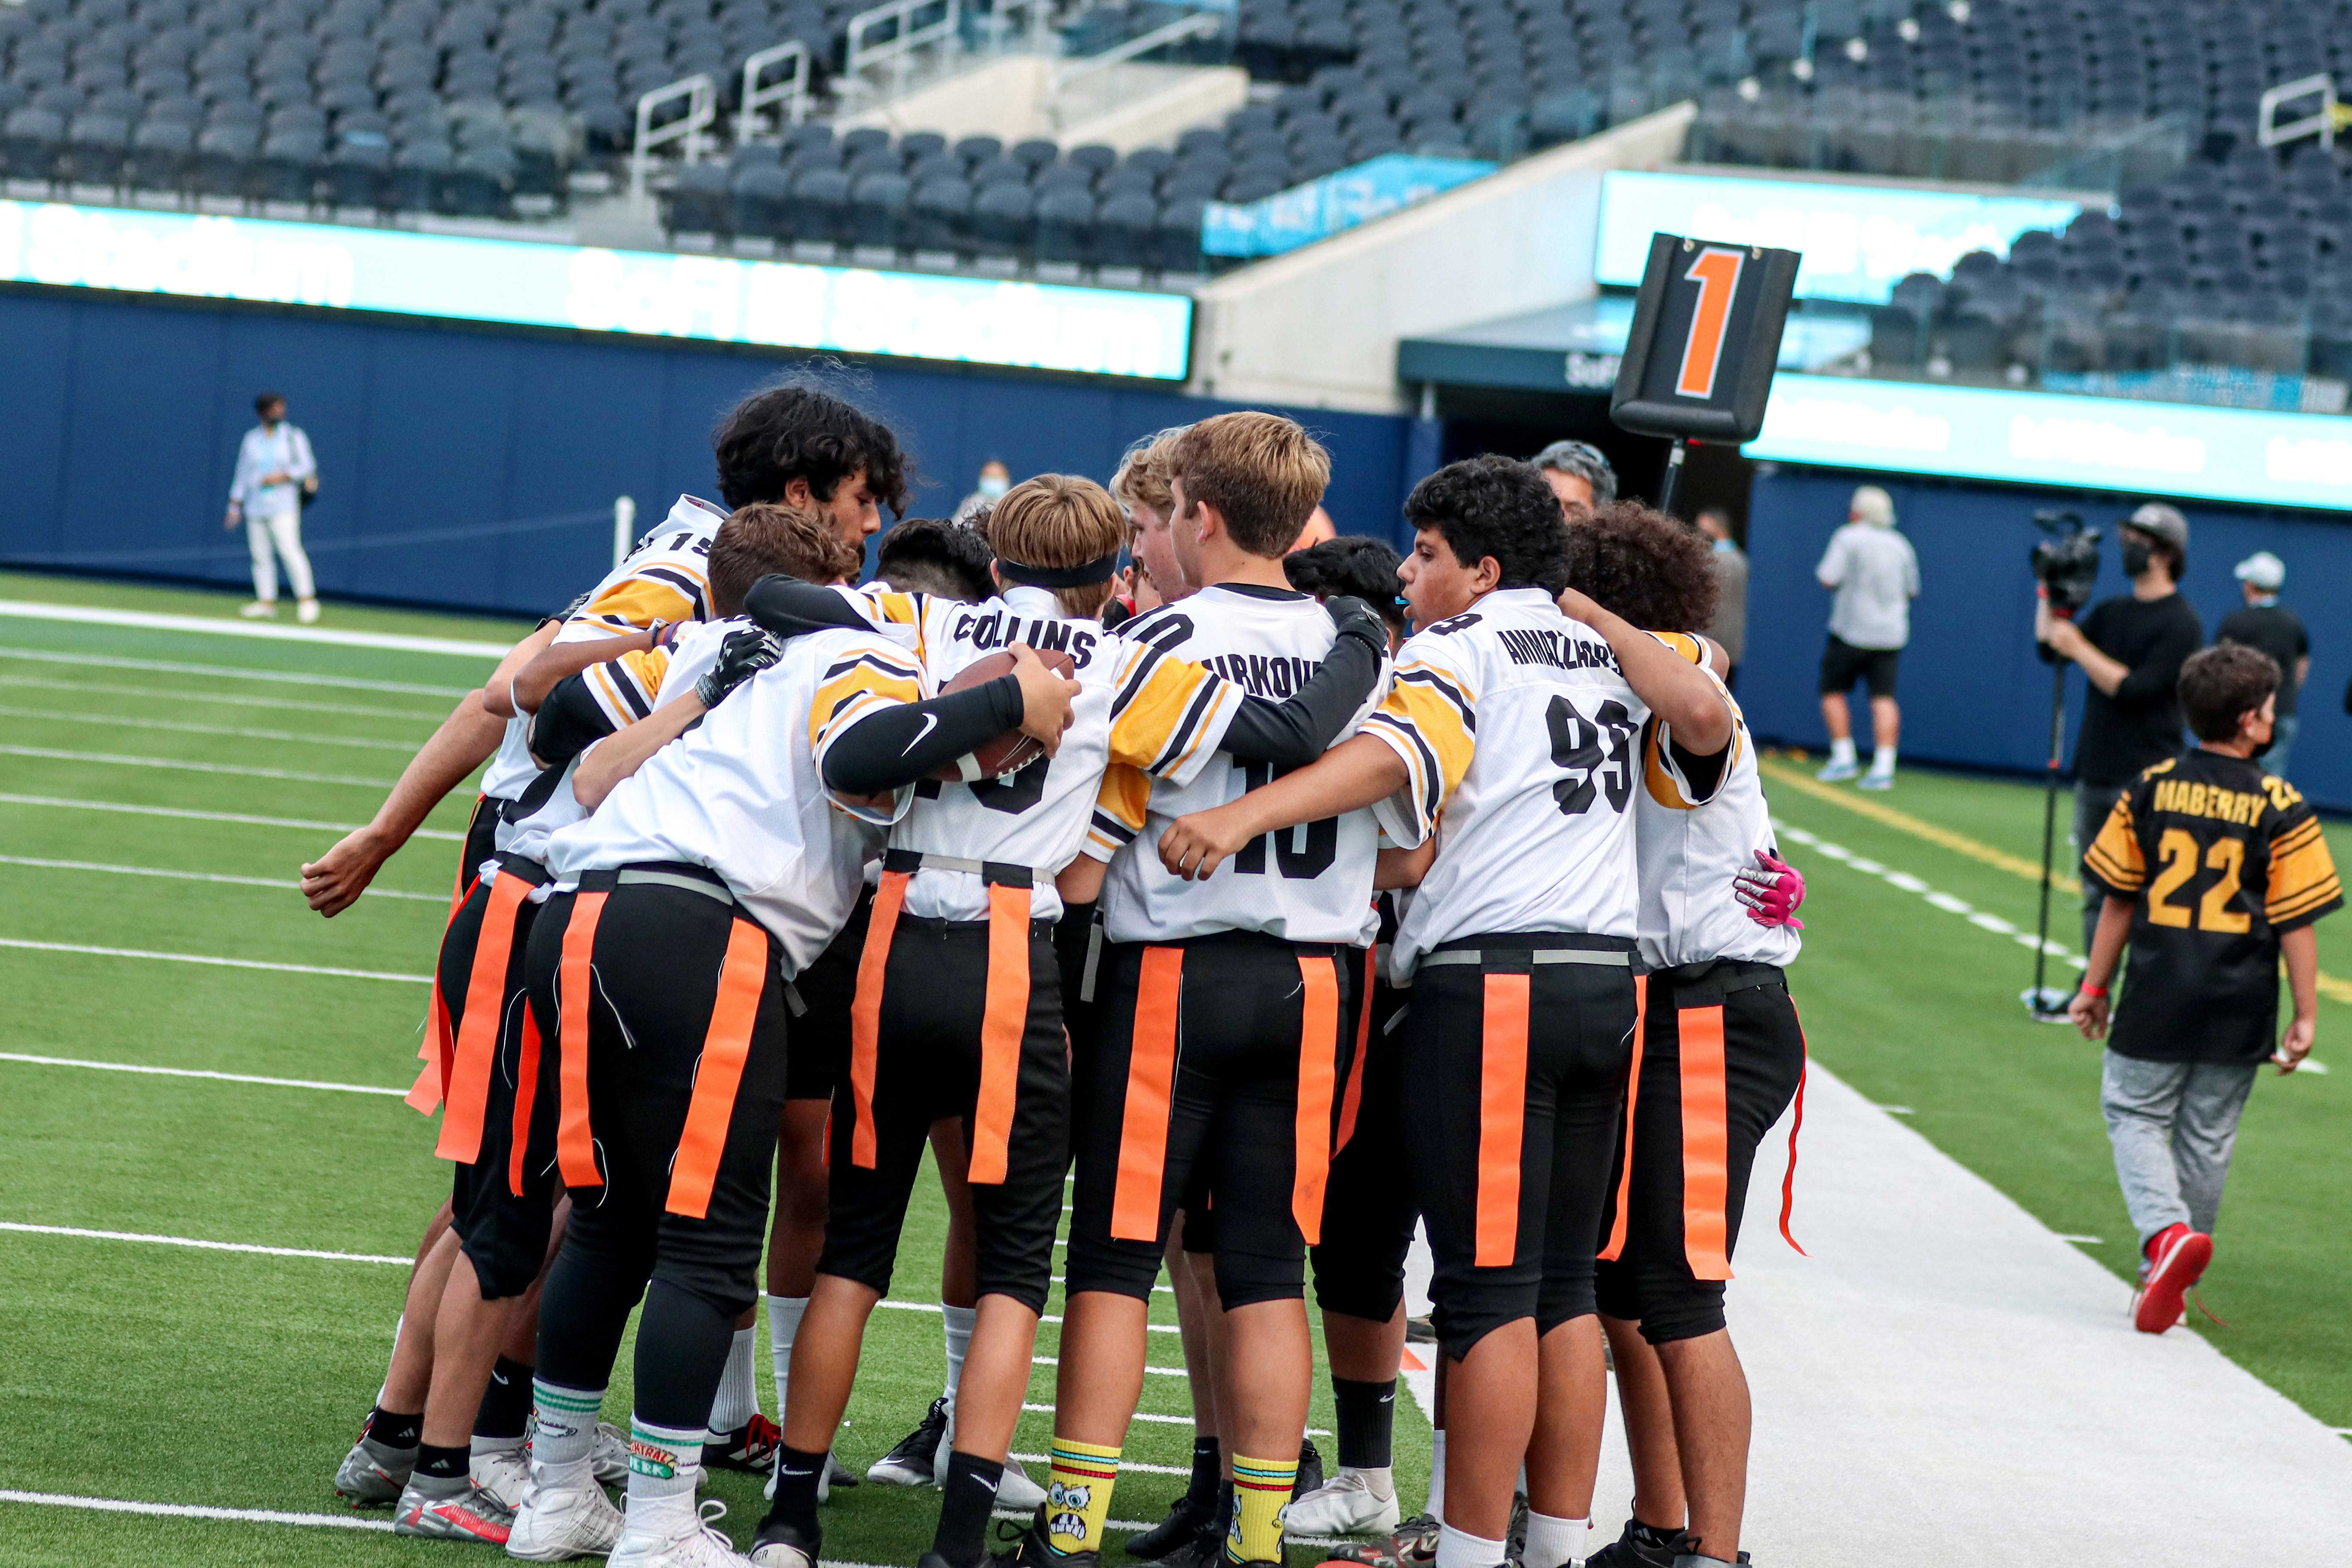 D13 Steelers Huddle